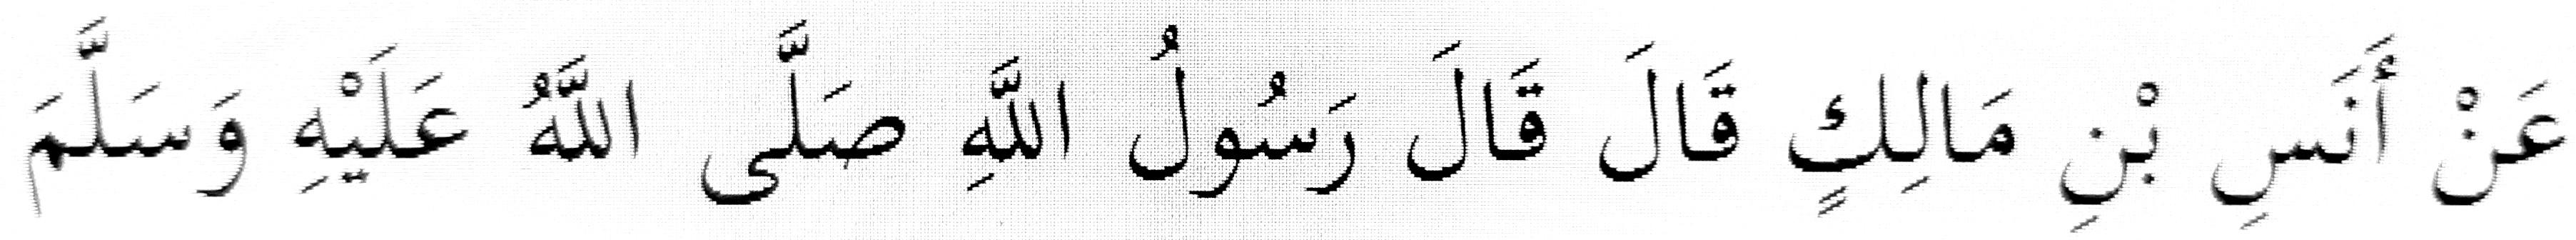 anas hadith